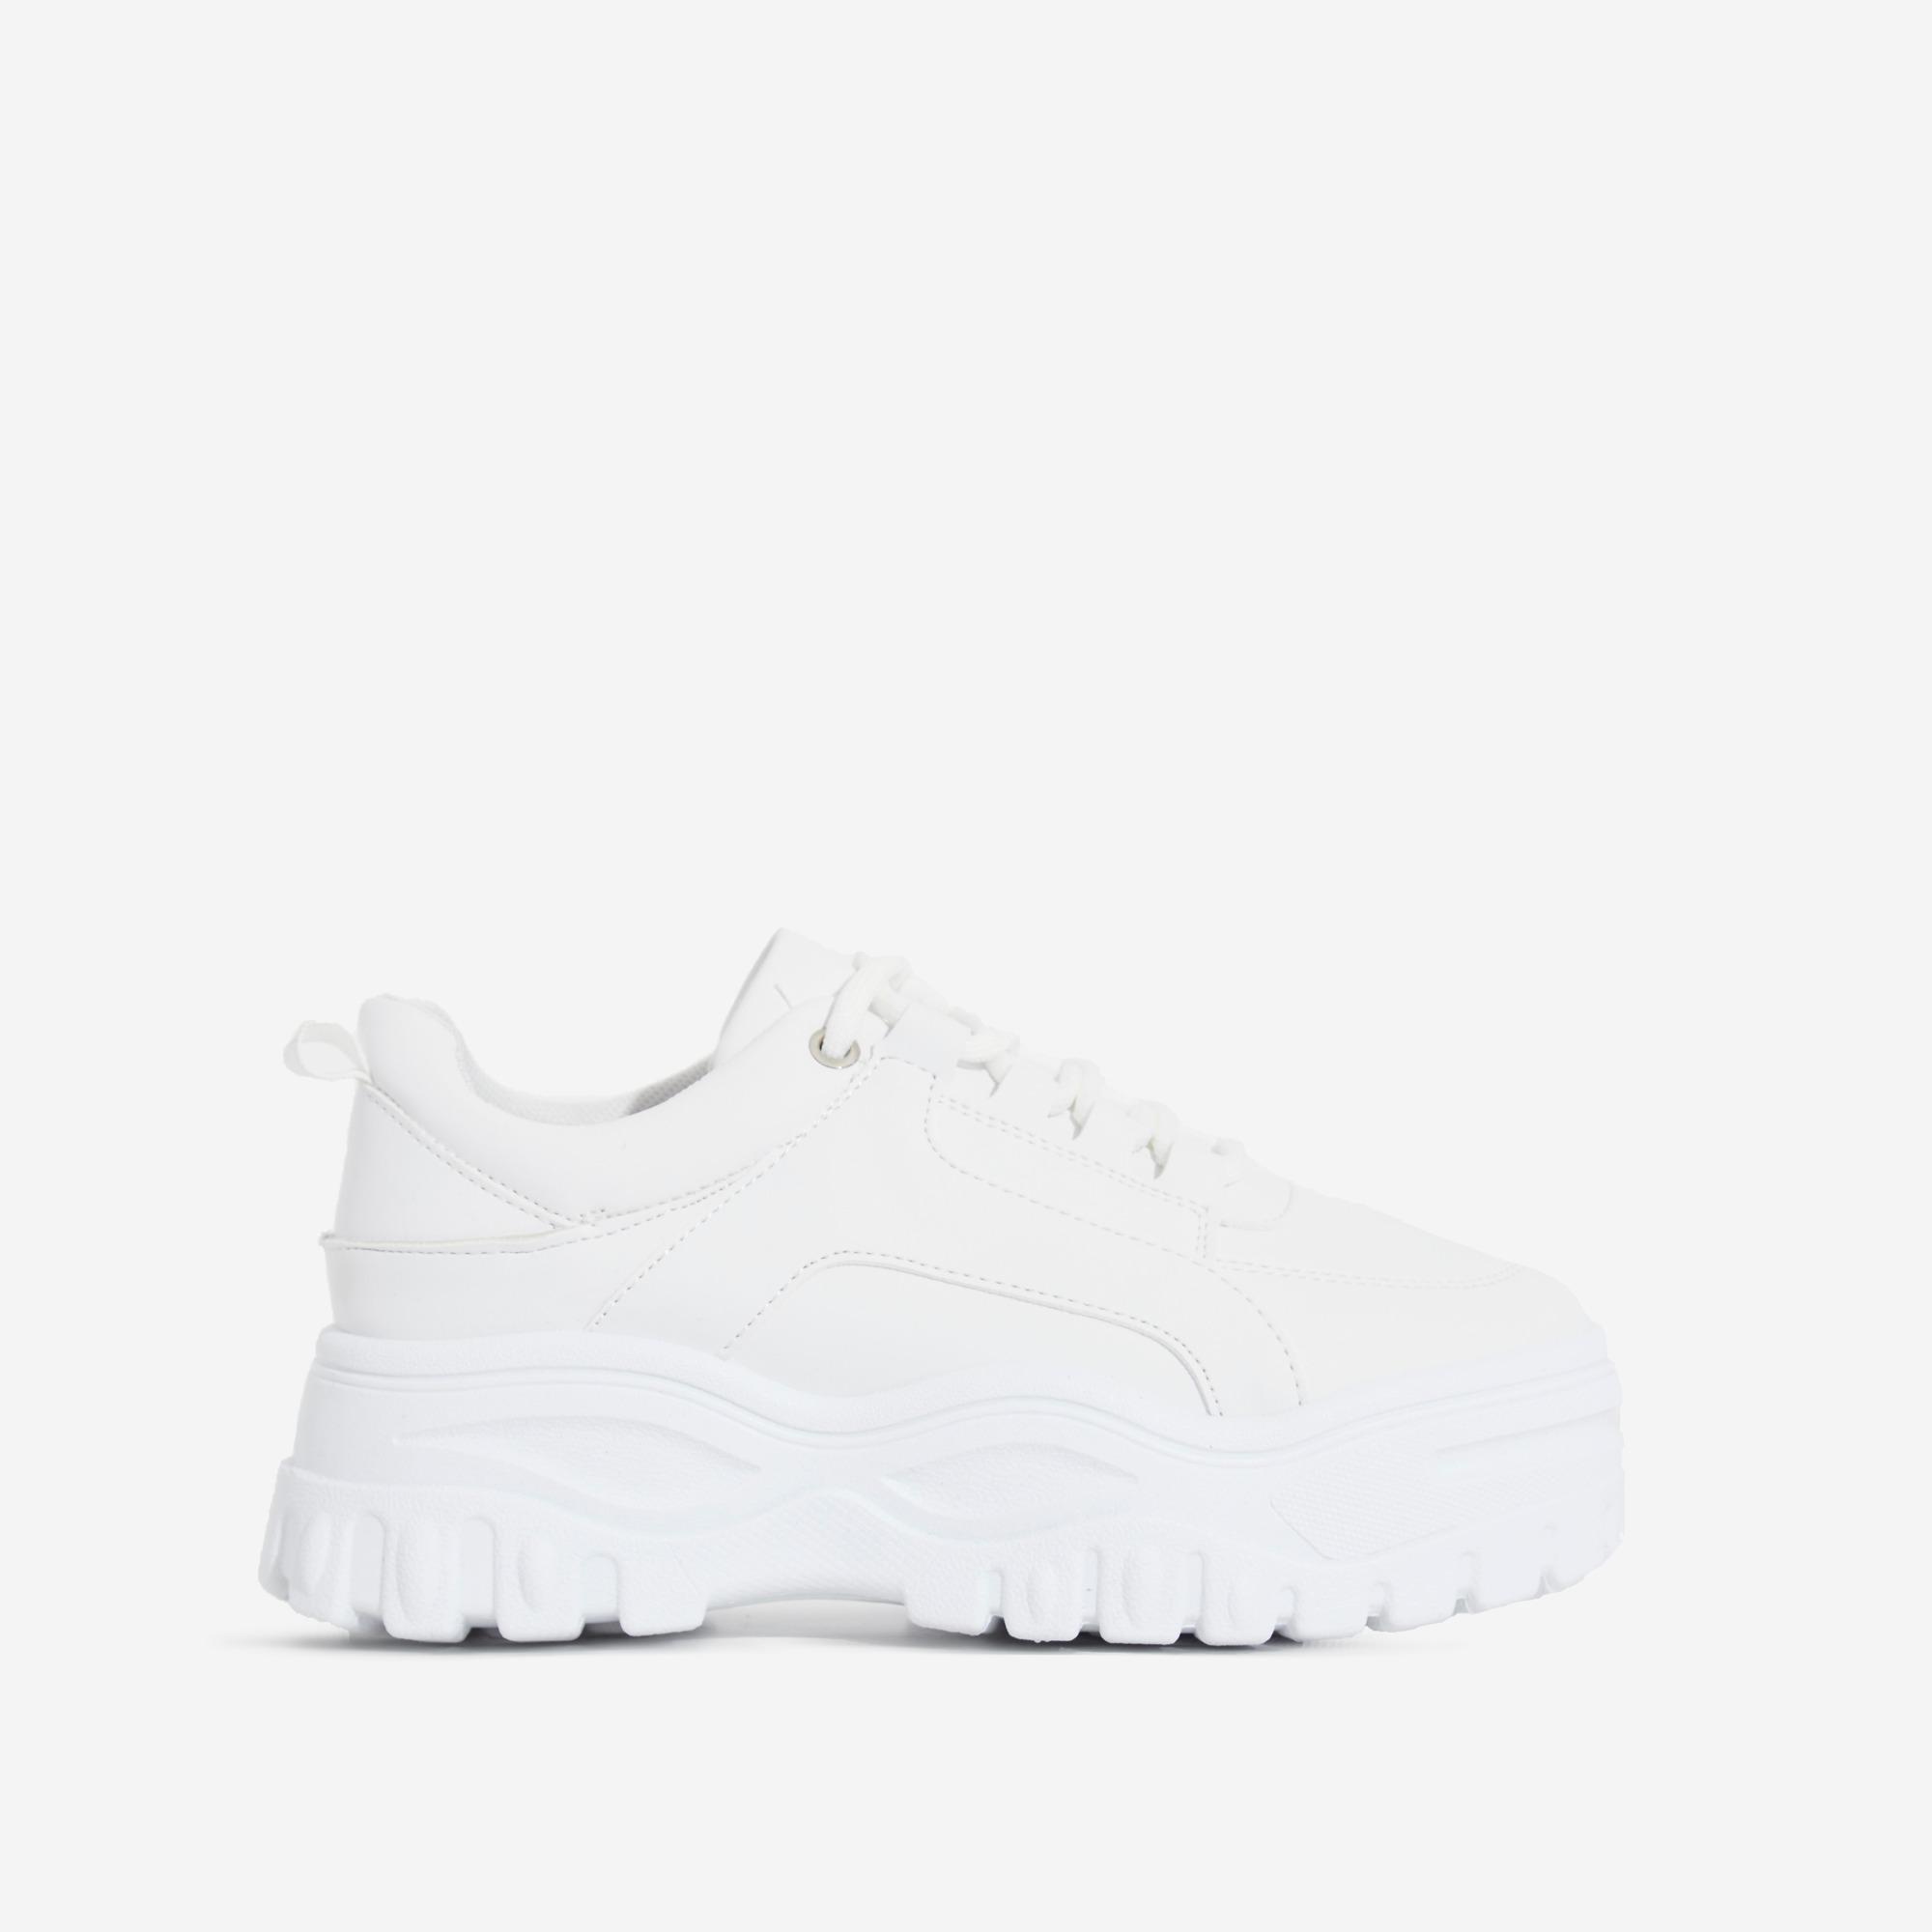 Tye Chunky Sole Trainer In White